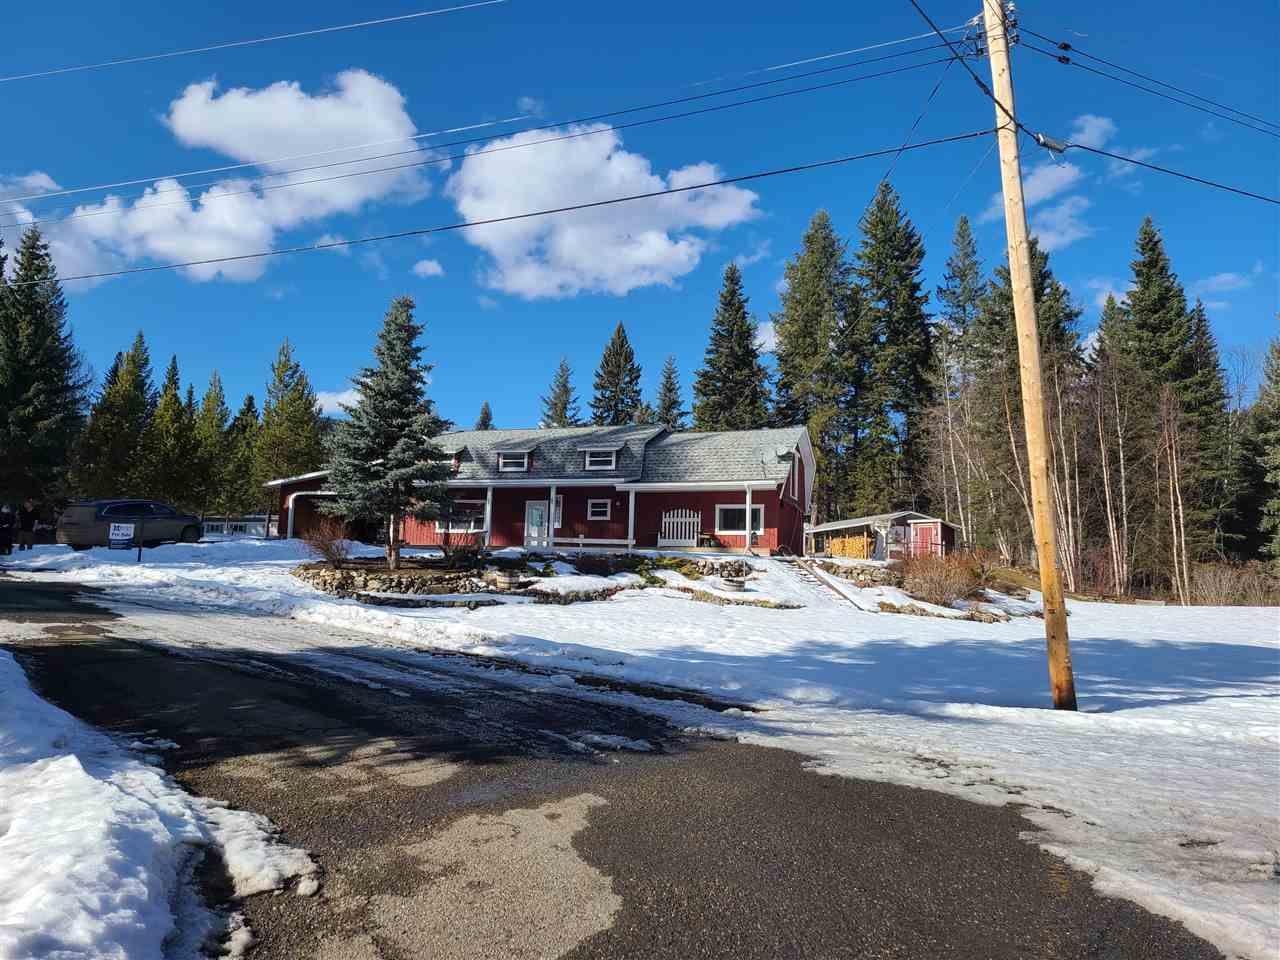 Main Photo: 7243 RAINBOW Crescent in Canim Lake: Canim/Mahood Lake House for sale (100 Mile House (Zone 10))  : MLS®# R2549546